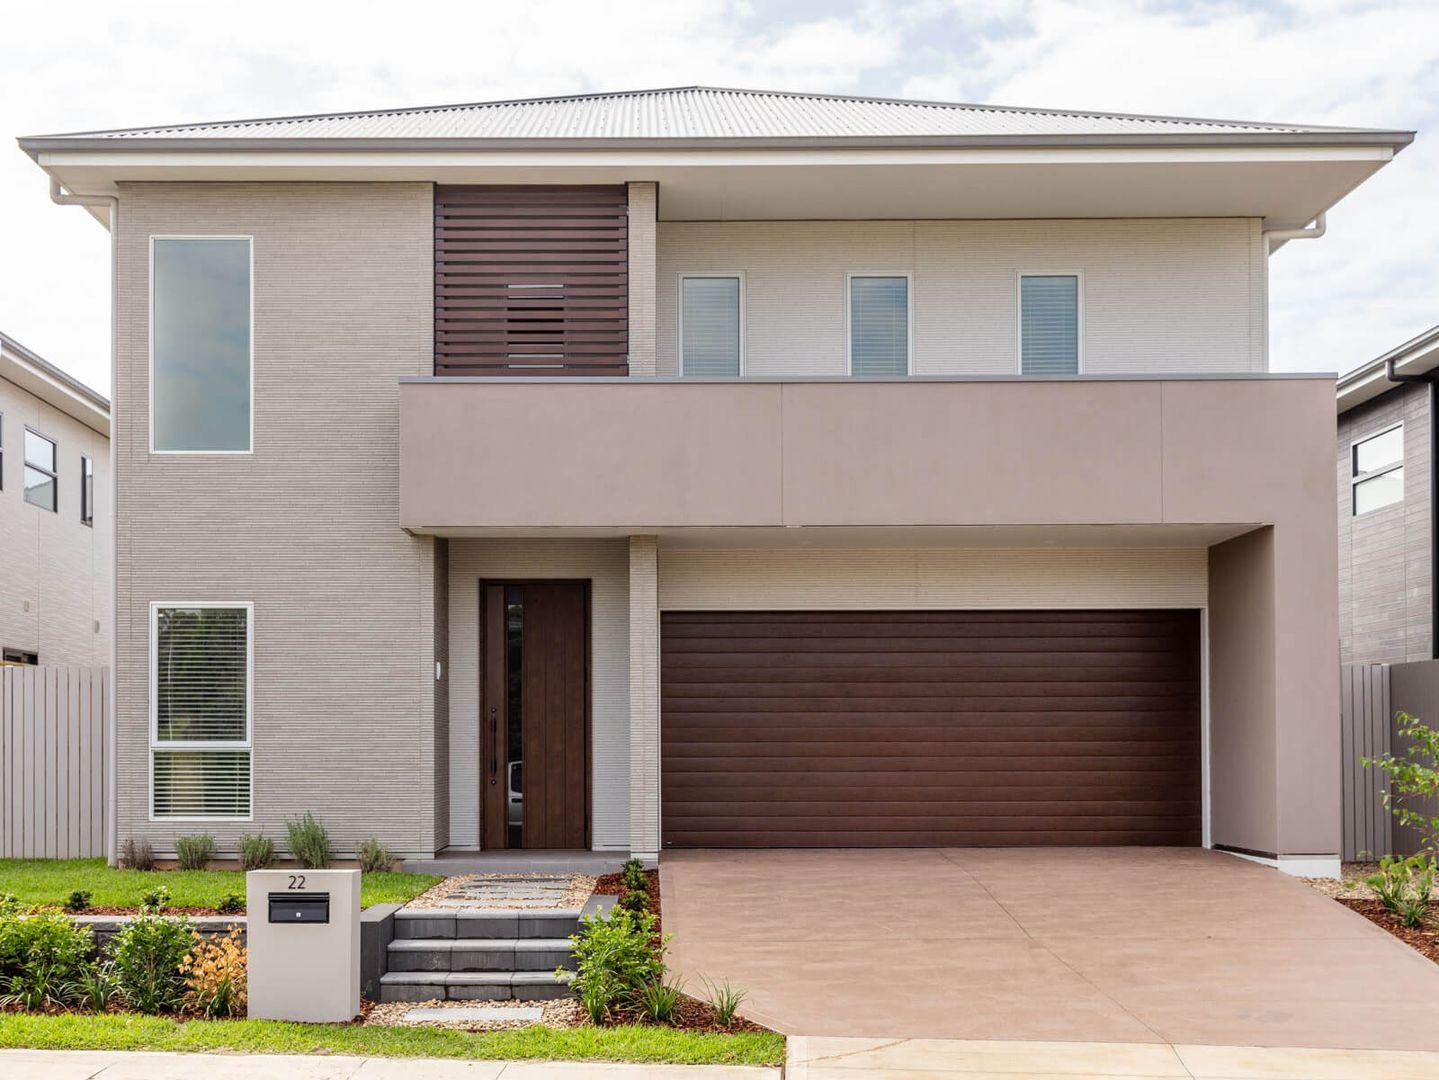 22 Merrick Way, Gledswood Hills NSW 2557, Image 0